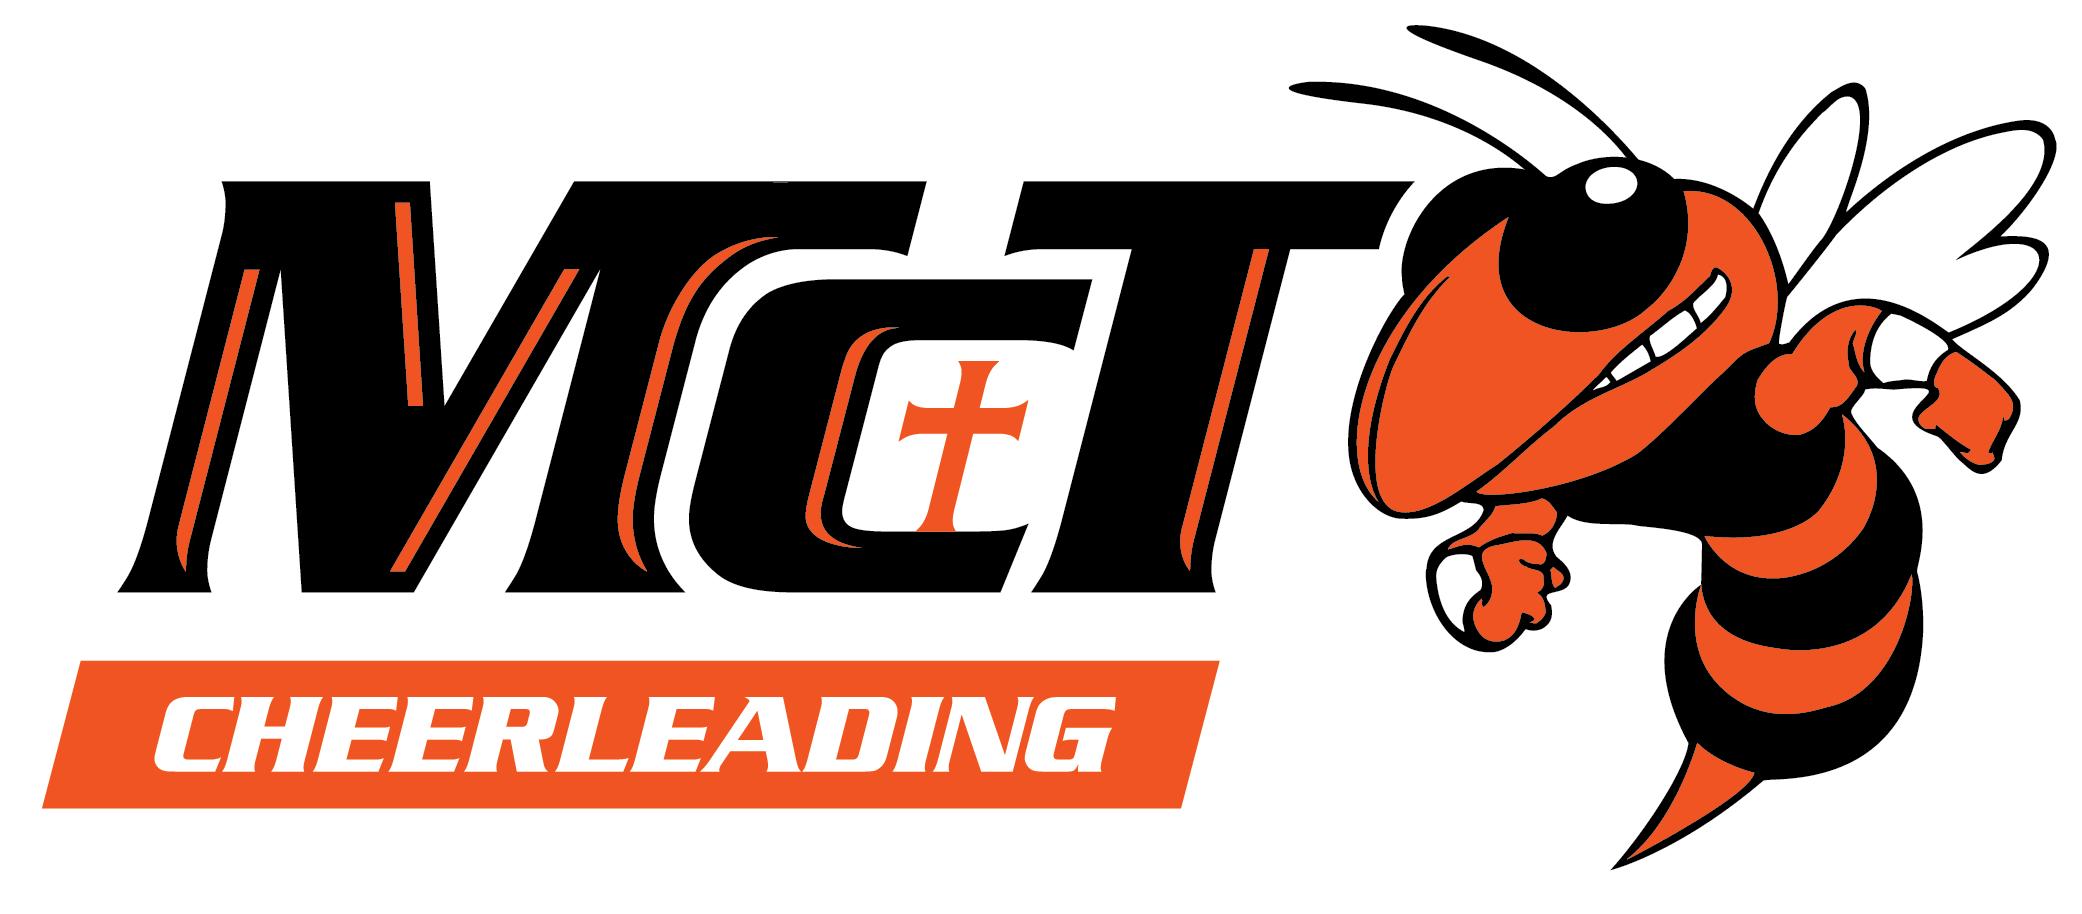 Grade school boys basketball and cheerleaders clipart svg library download Cheerleading Home – Cheerleading – McGill-Toolen Catholic High School svg library download